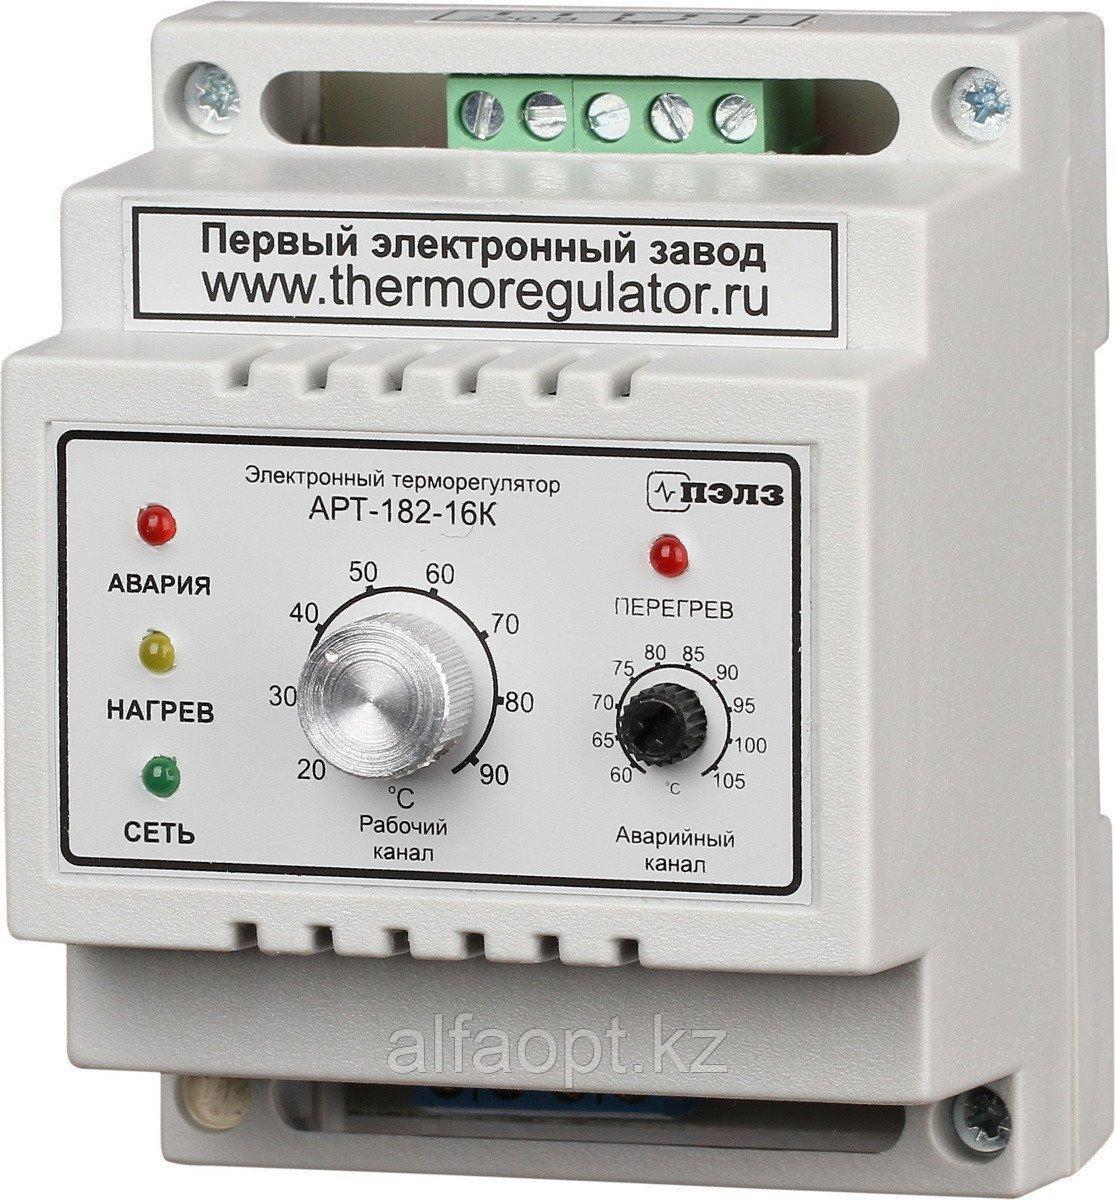 Терморегулятор АРТ-182-16 с датчиками KTY-81-110 3 кВт DIN